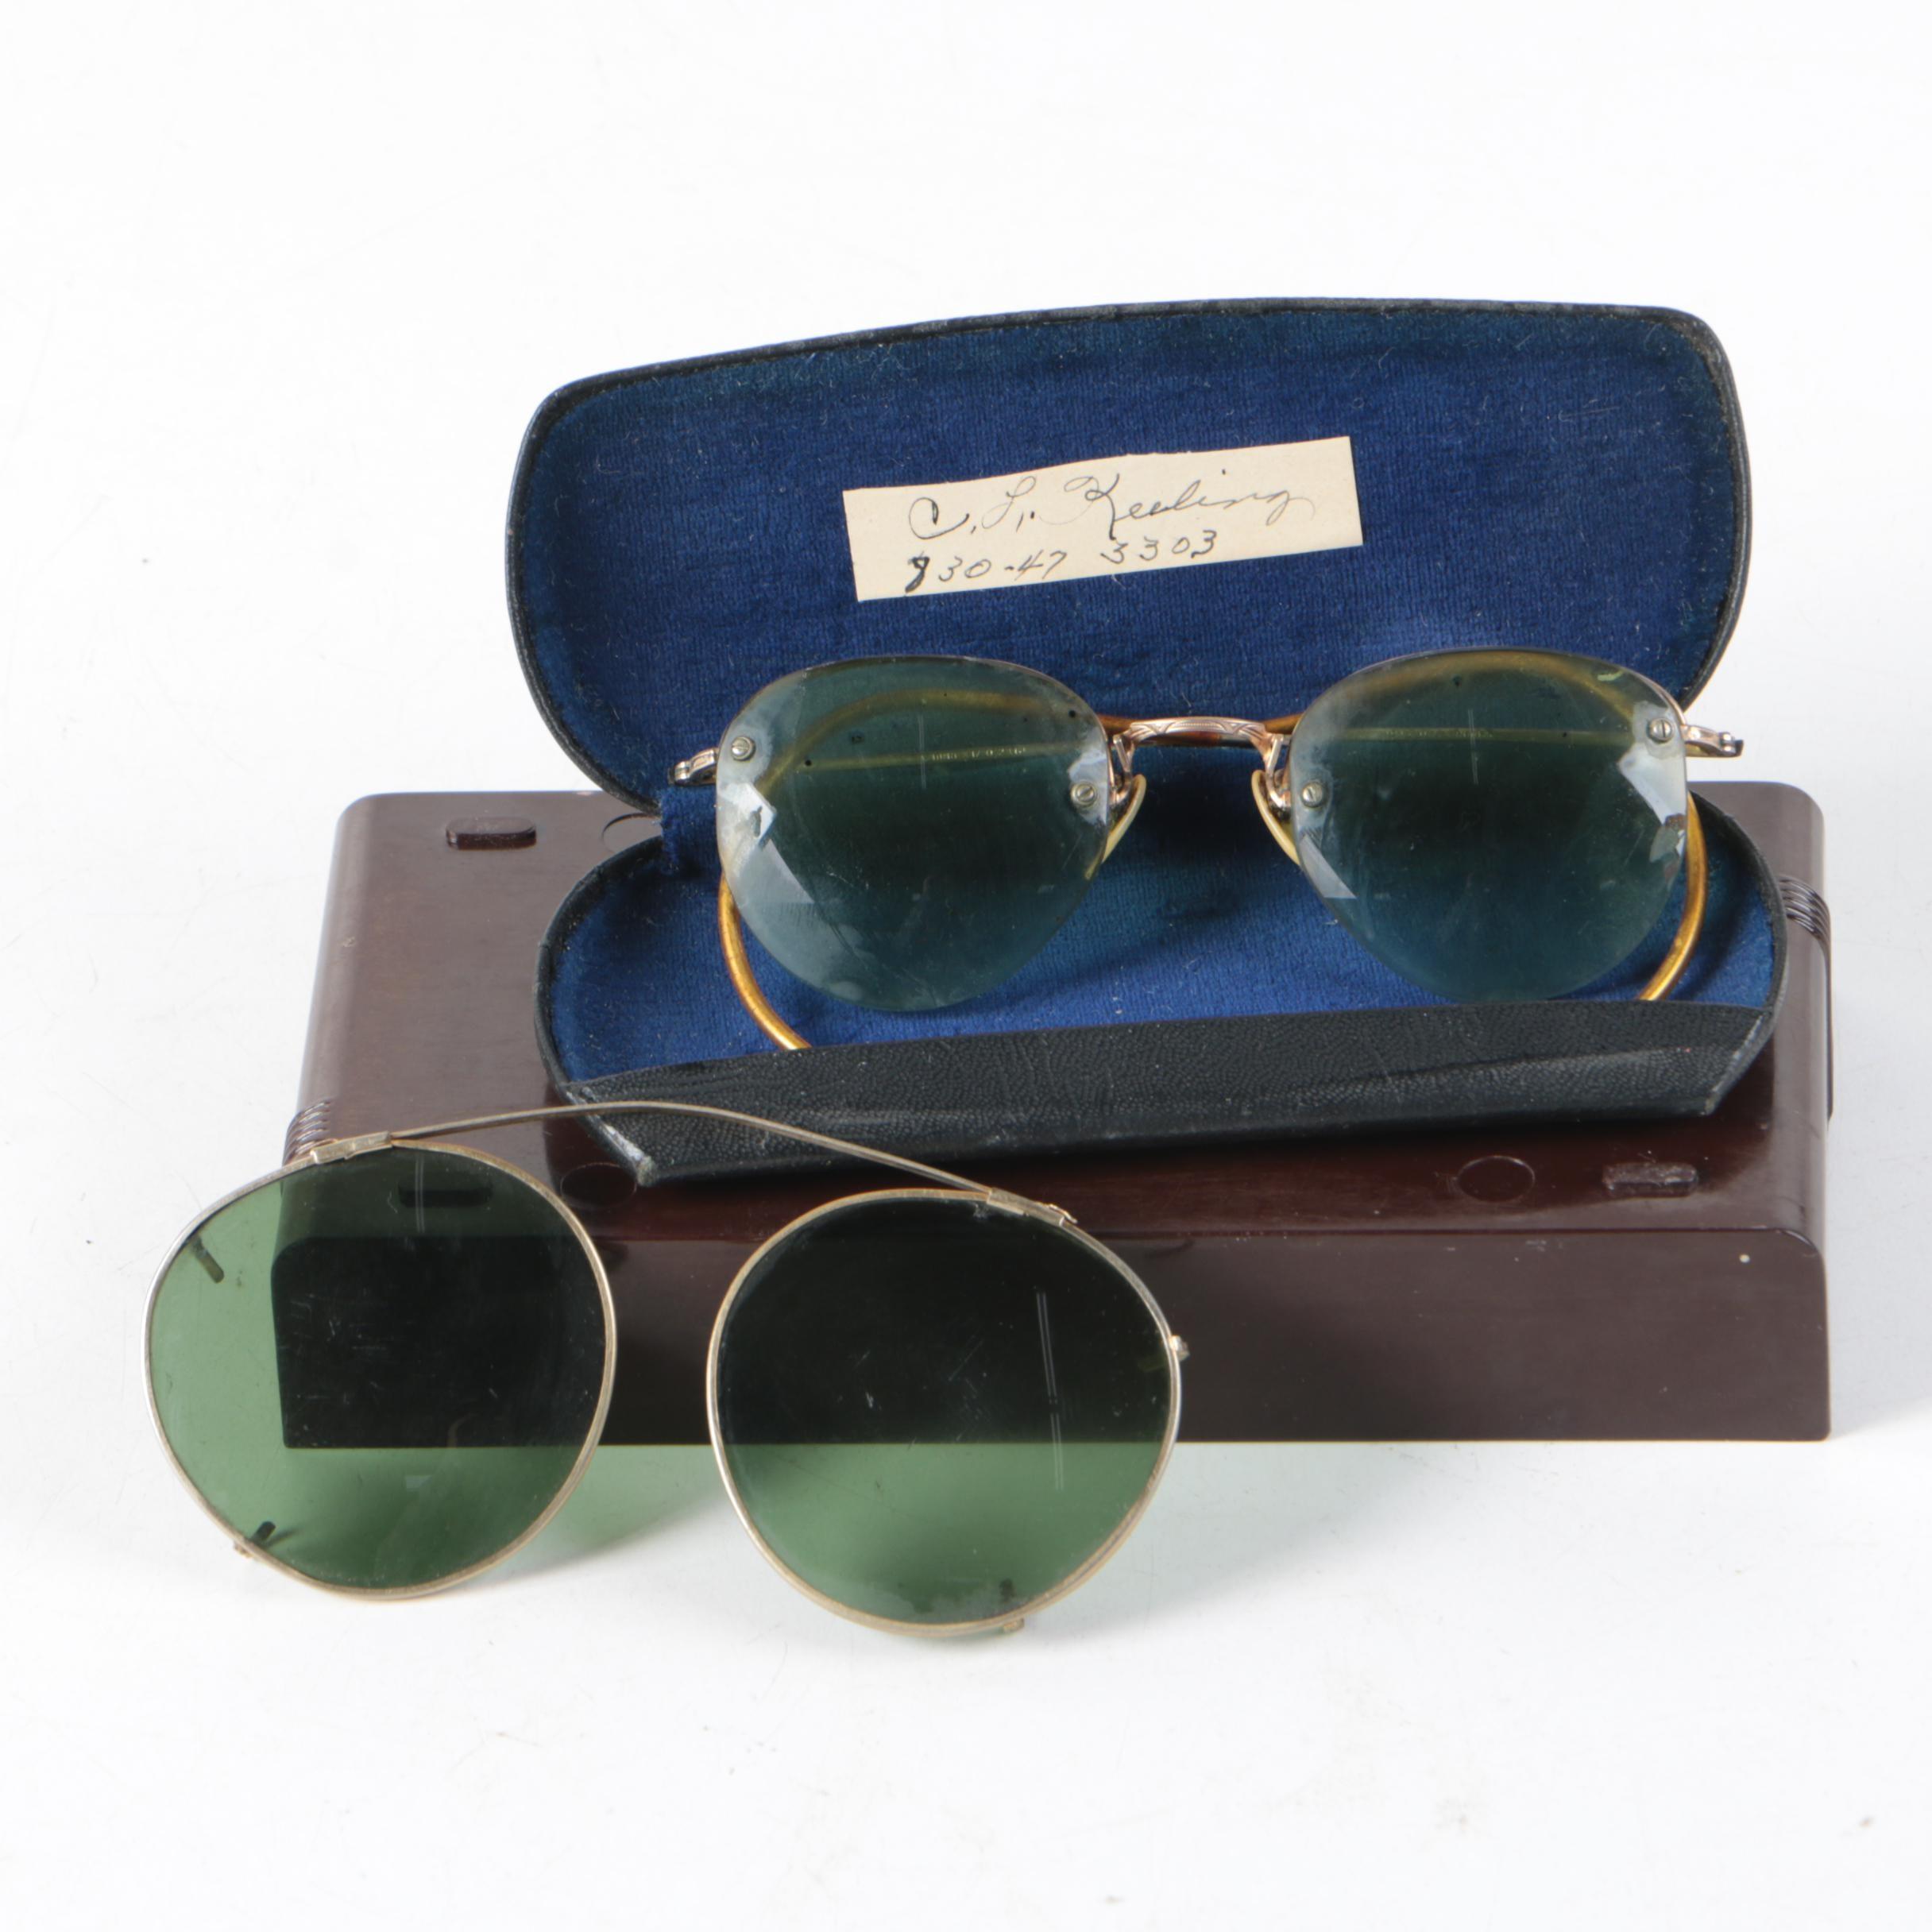 Vintage Shuron 12K Gold Filled Prescription Sunglasses and Clip-On Sunglasses